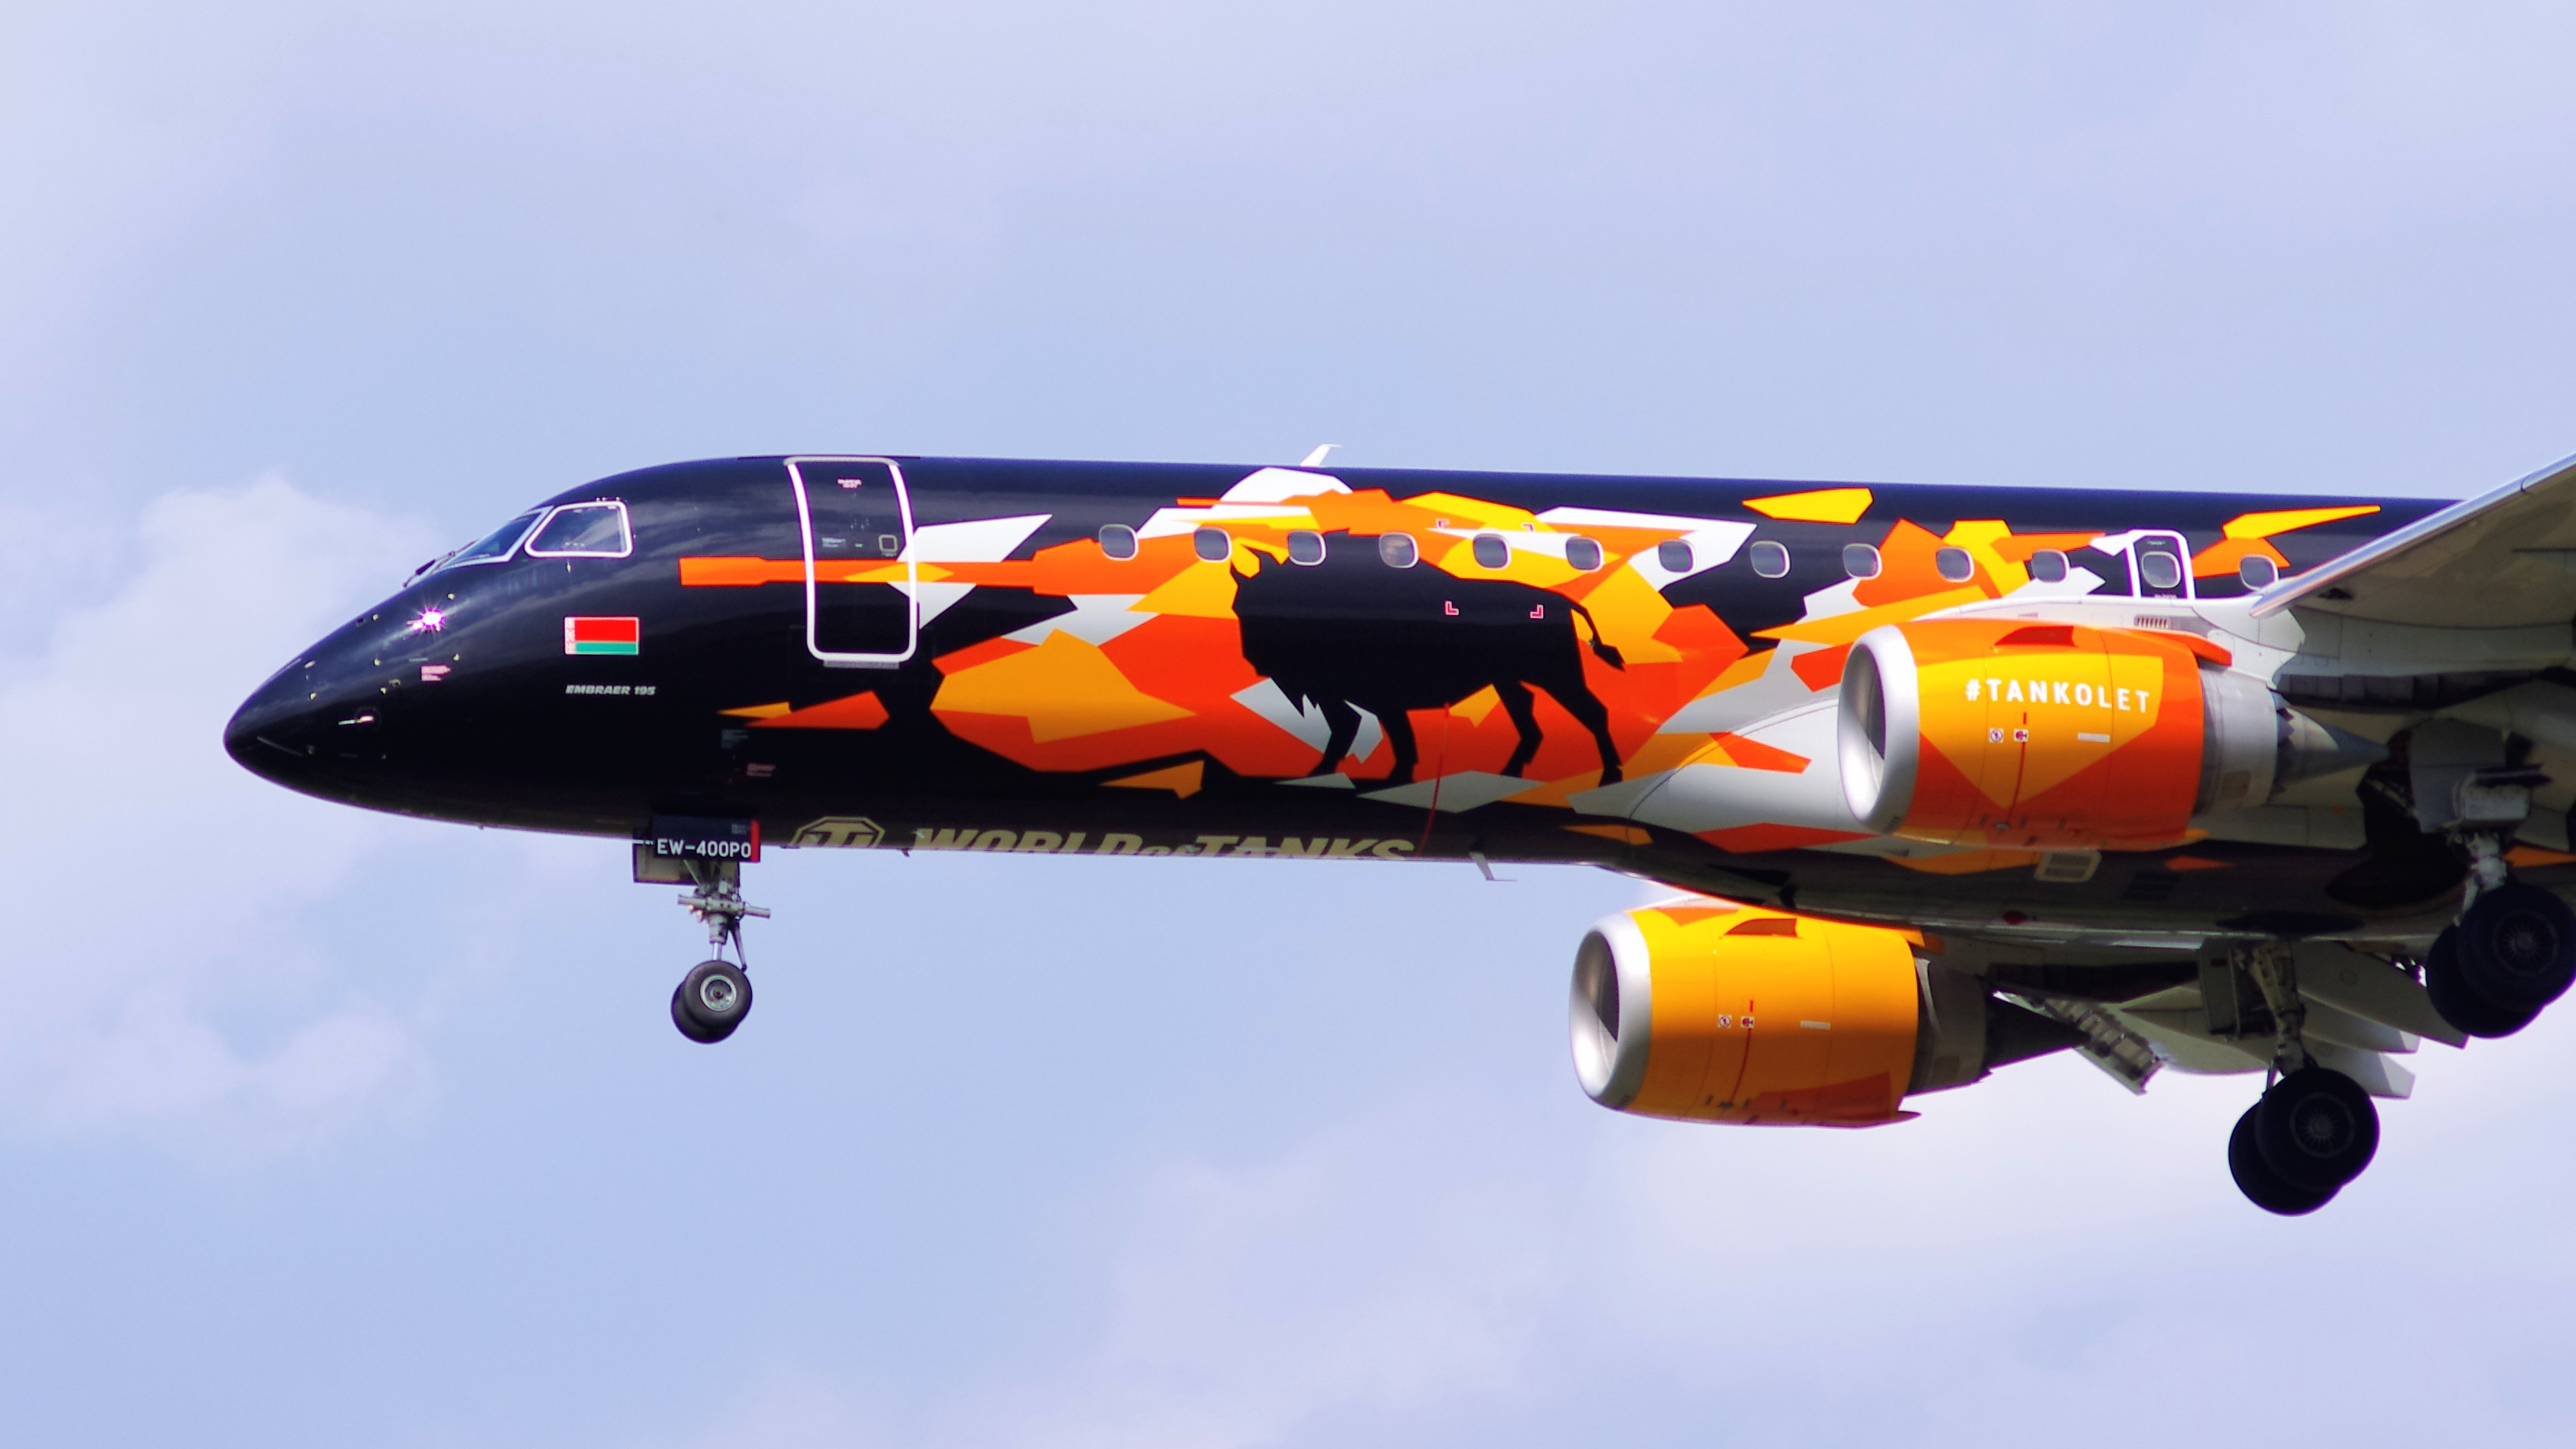 Embraer 190-200LR EW-400PO